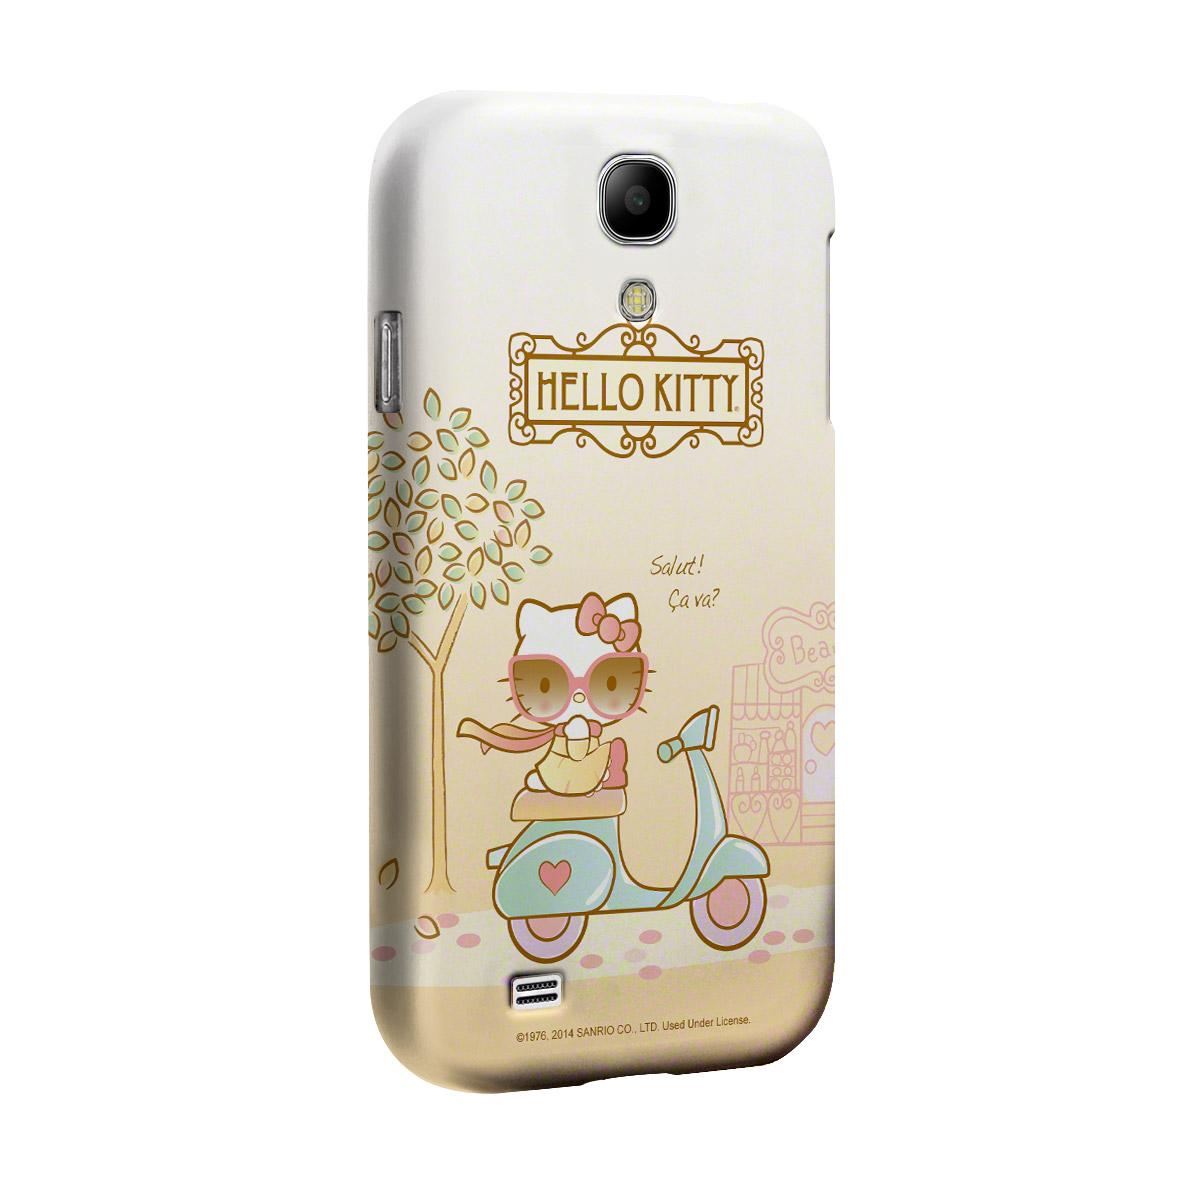 Capa de Celular Samsung S4 Hello Kitty Salut! Ça Va?